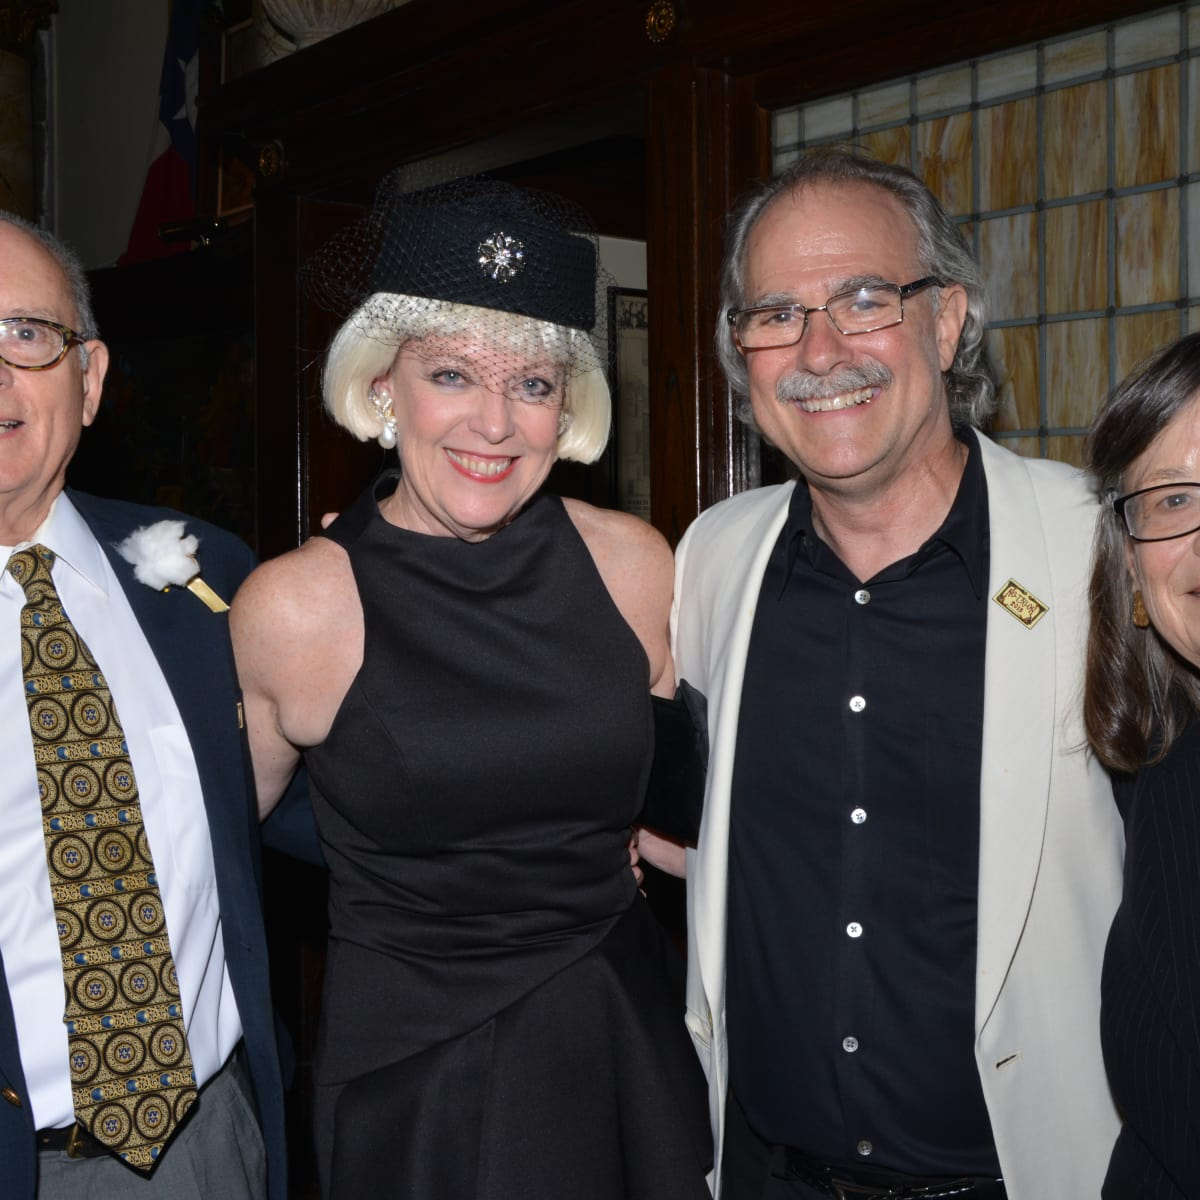 Houston, No-Tsu-Oh gala, September 2015, Bob Pando, Terri DiRaddo, Andy DiRaddo and Trilla Pando